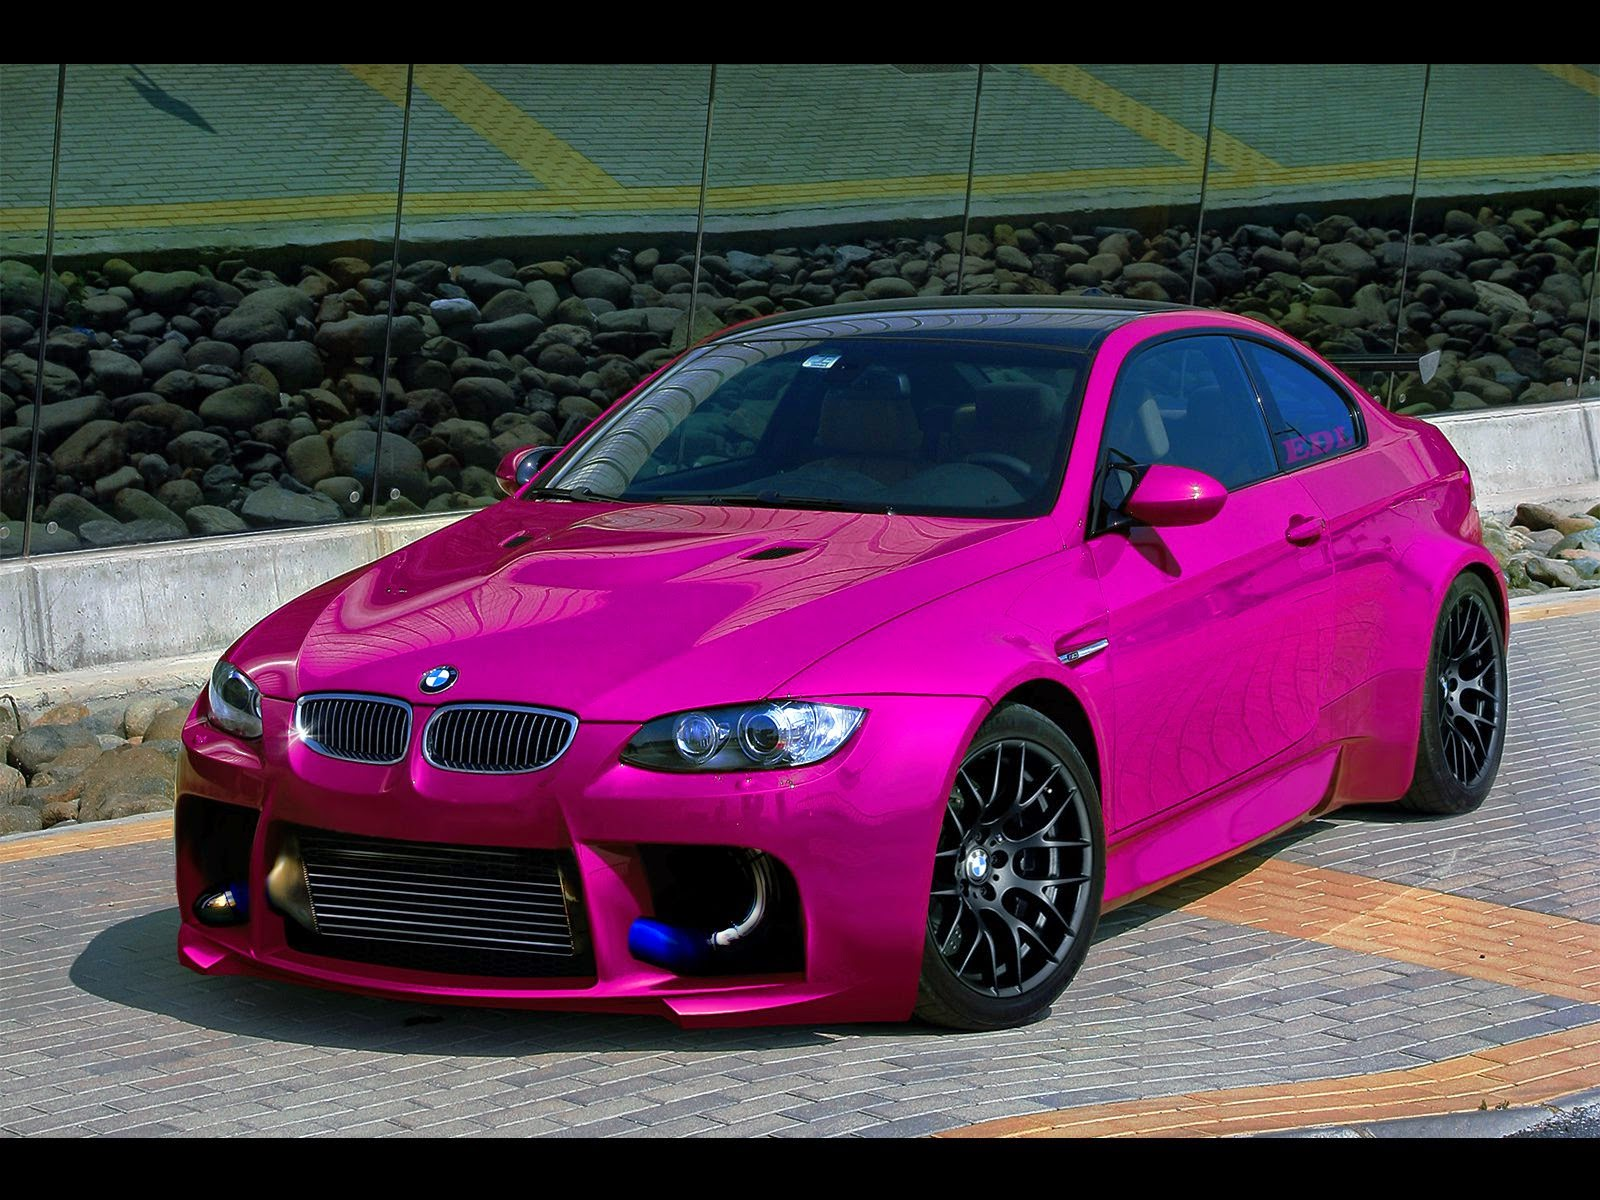 Gambar Modifikasi Mobil BMW Pink